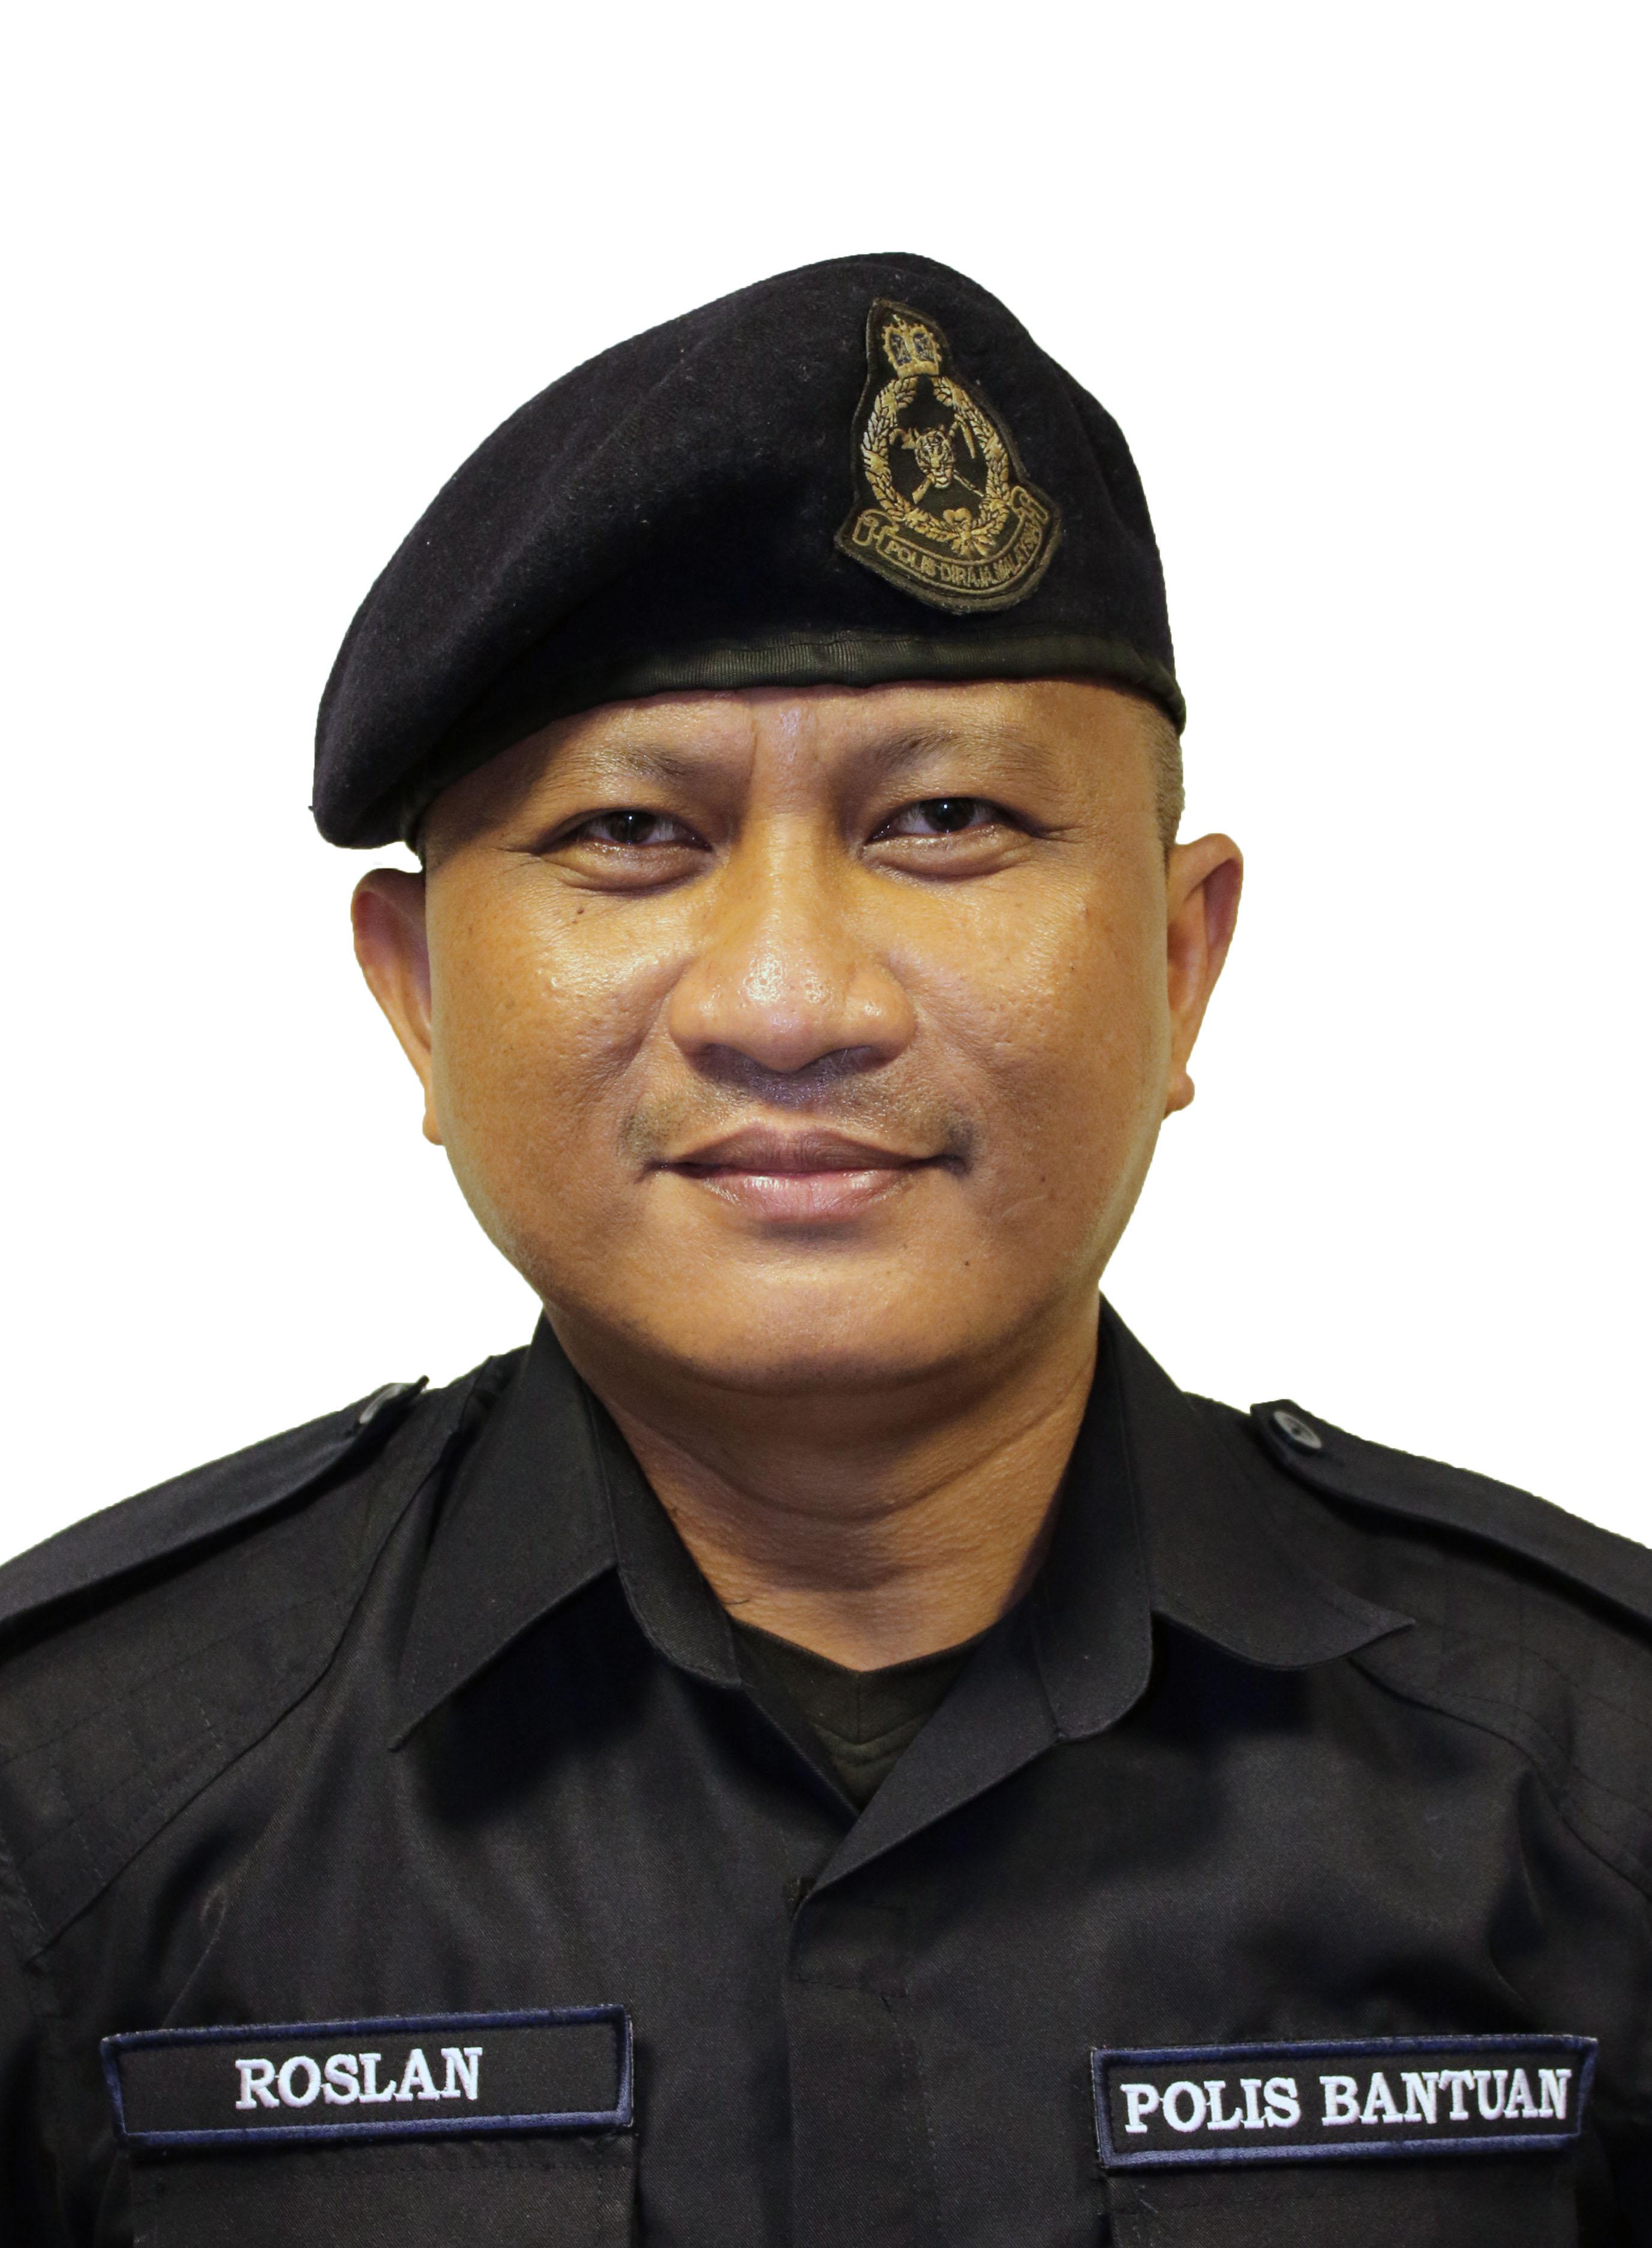 Cpl. Awang Roslan Bin Mohd Ithnin